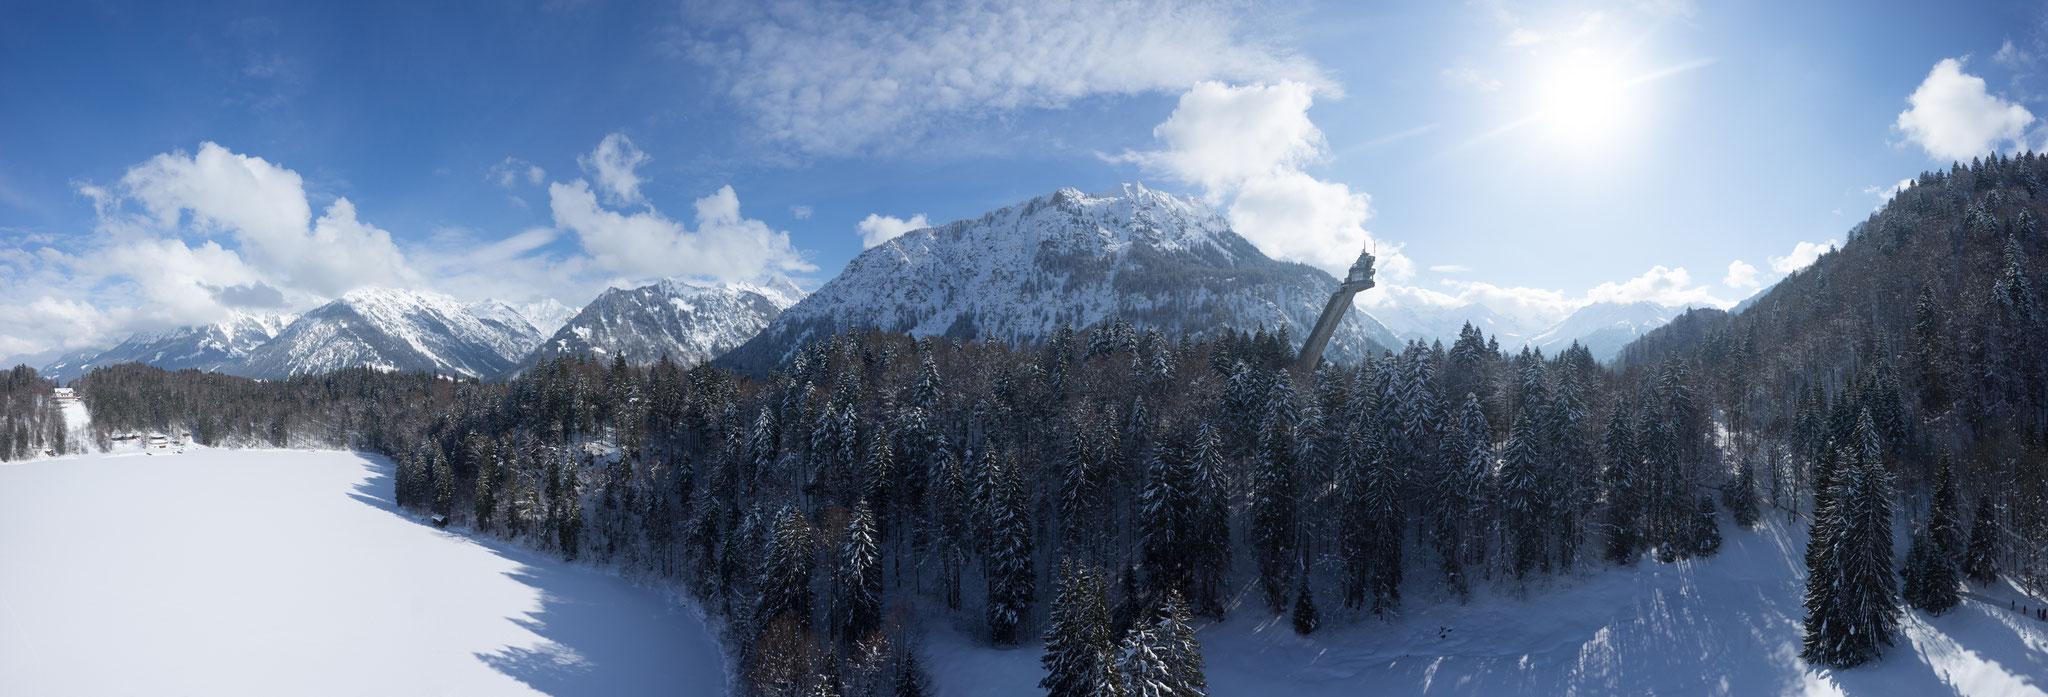 "Heini-Klopfer-Skiflugschanze, Bildrechte ""TourismusOberstdorf"""